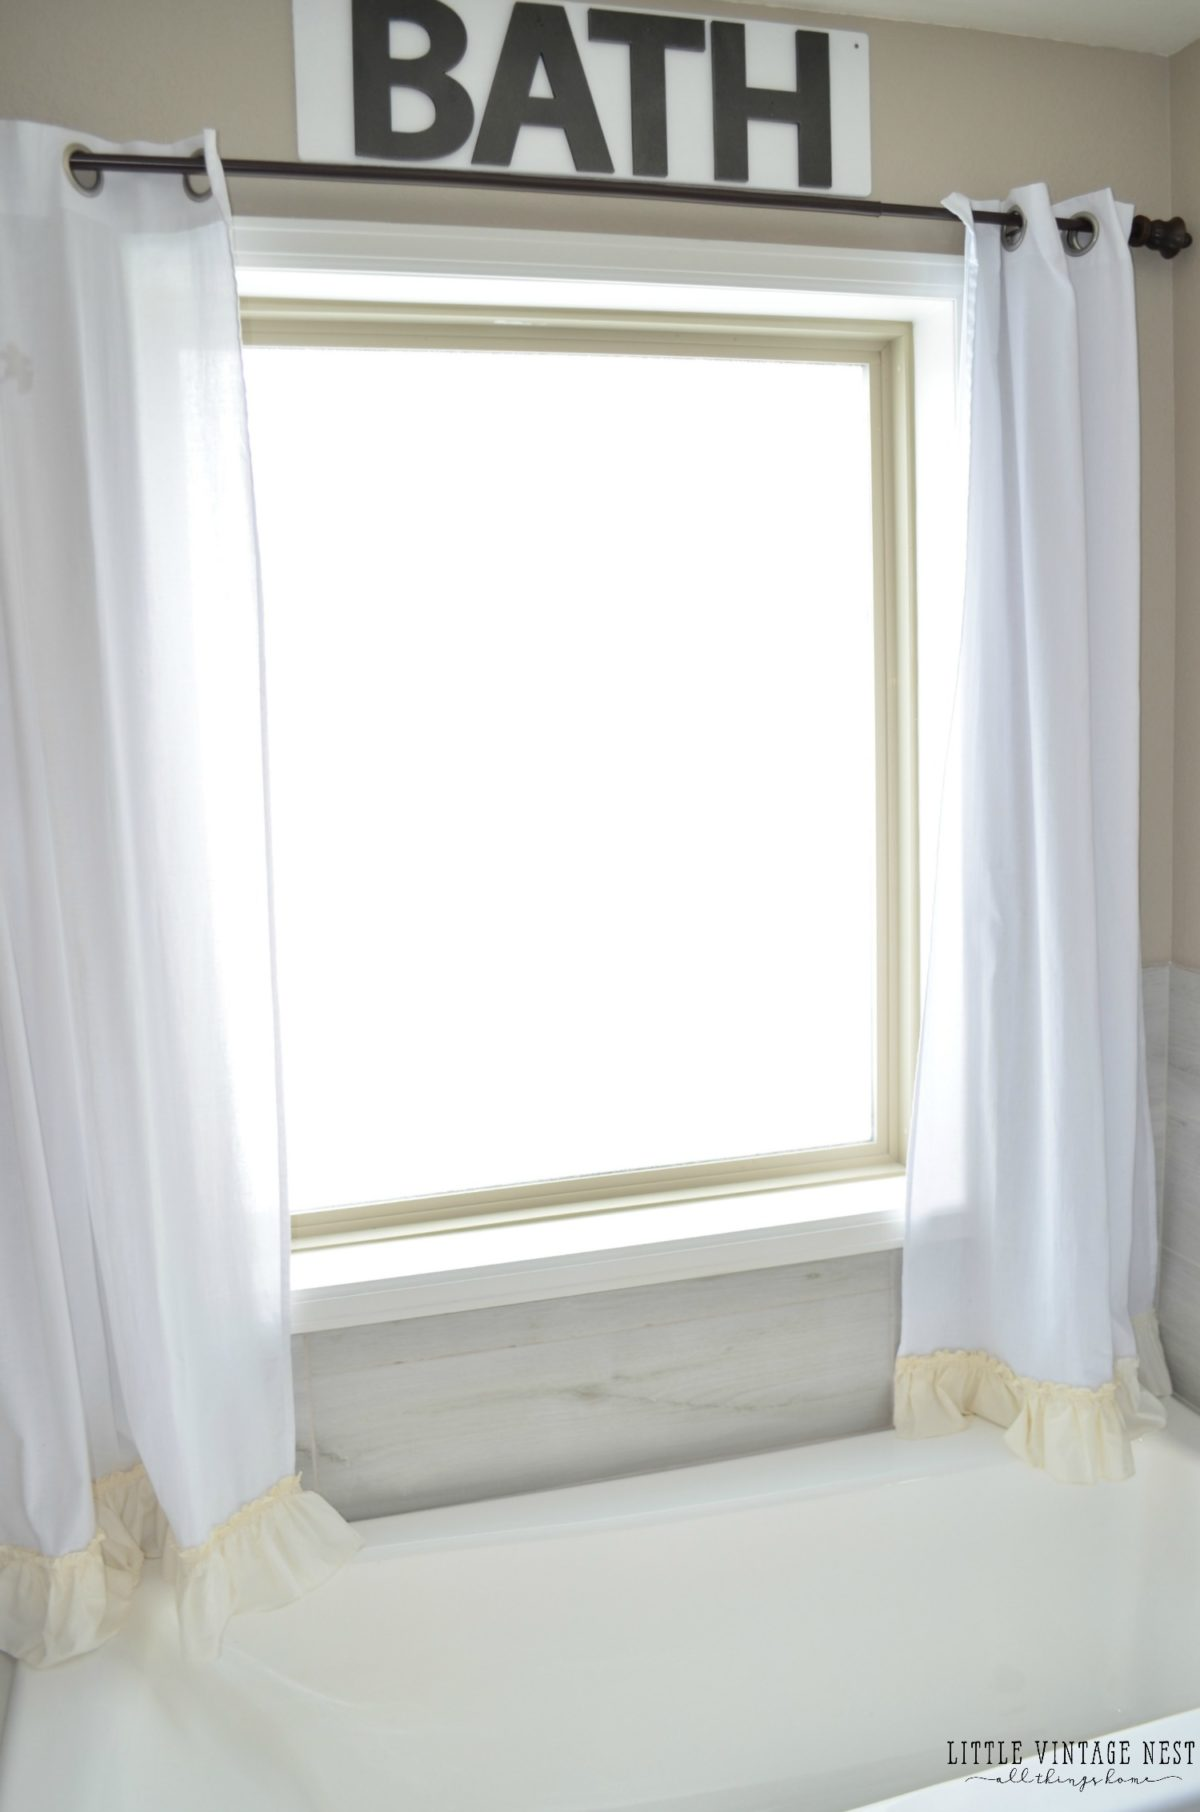 New No Sew Farmhouse Curtains - Little Vintage Nest PQ86